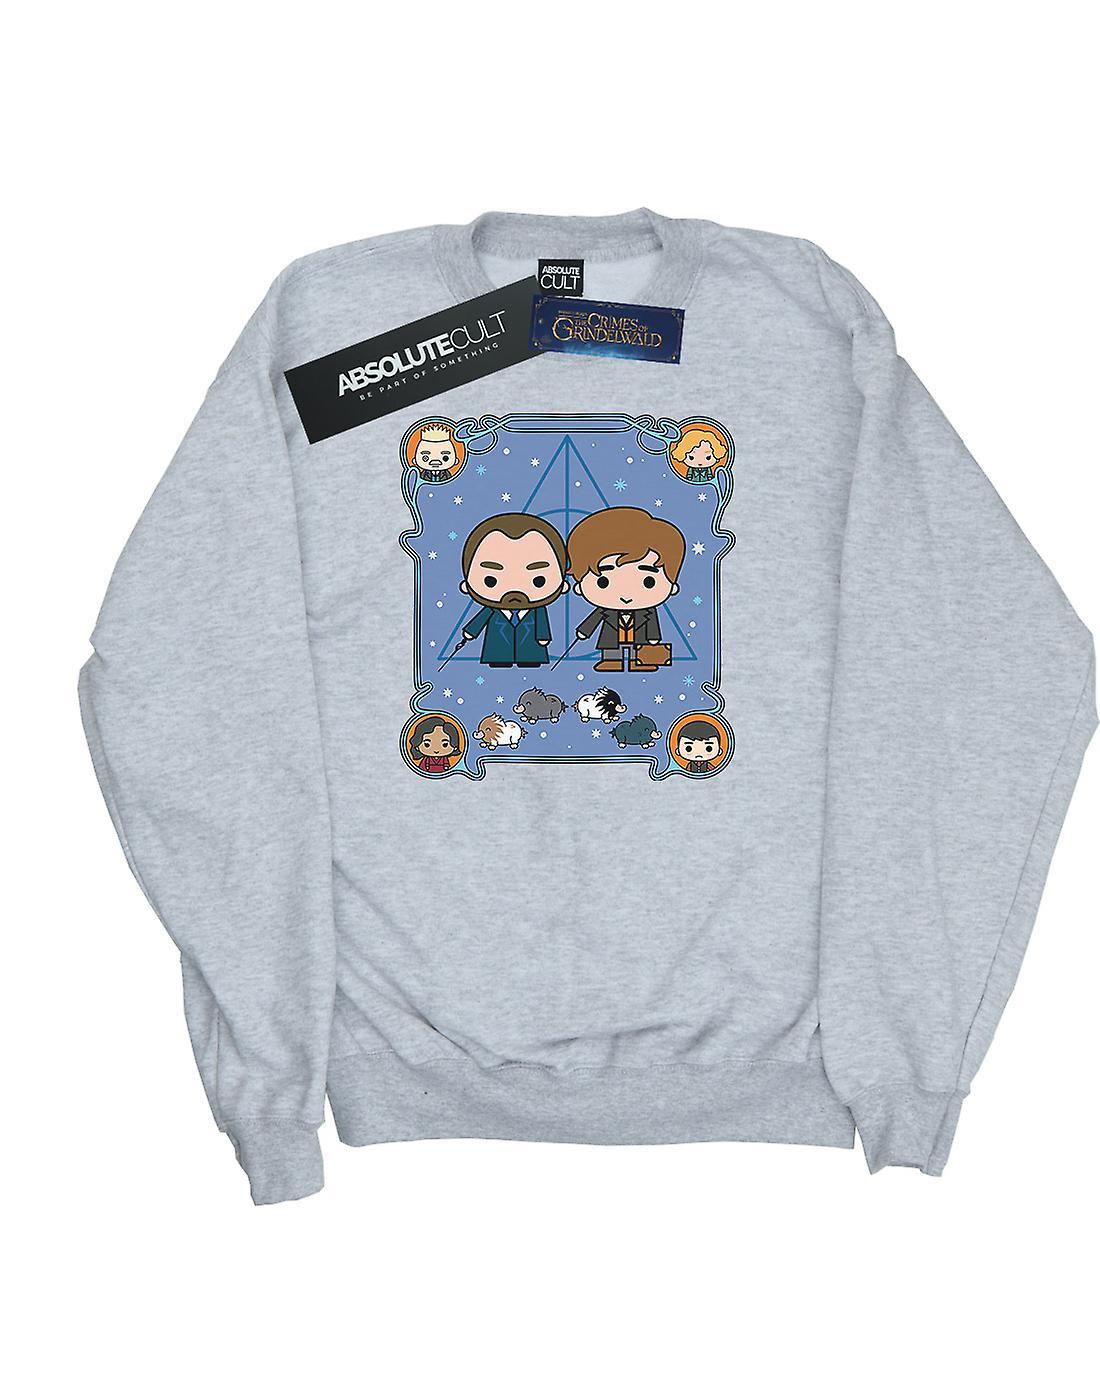 Fantastic Beasts Men's Chibi Newt And Dumbledore Sweatshirt